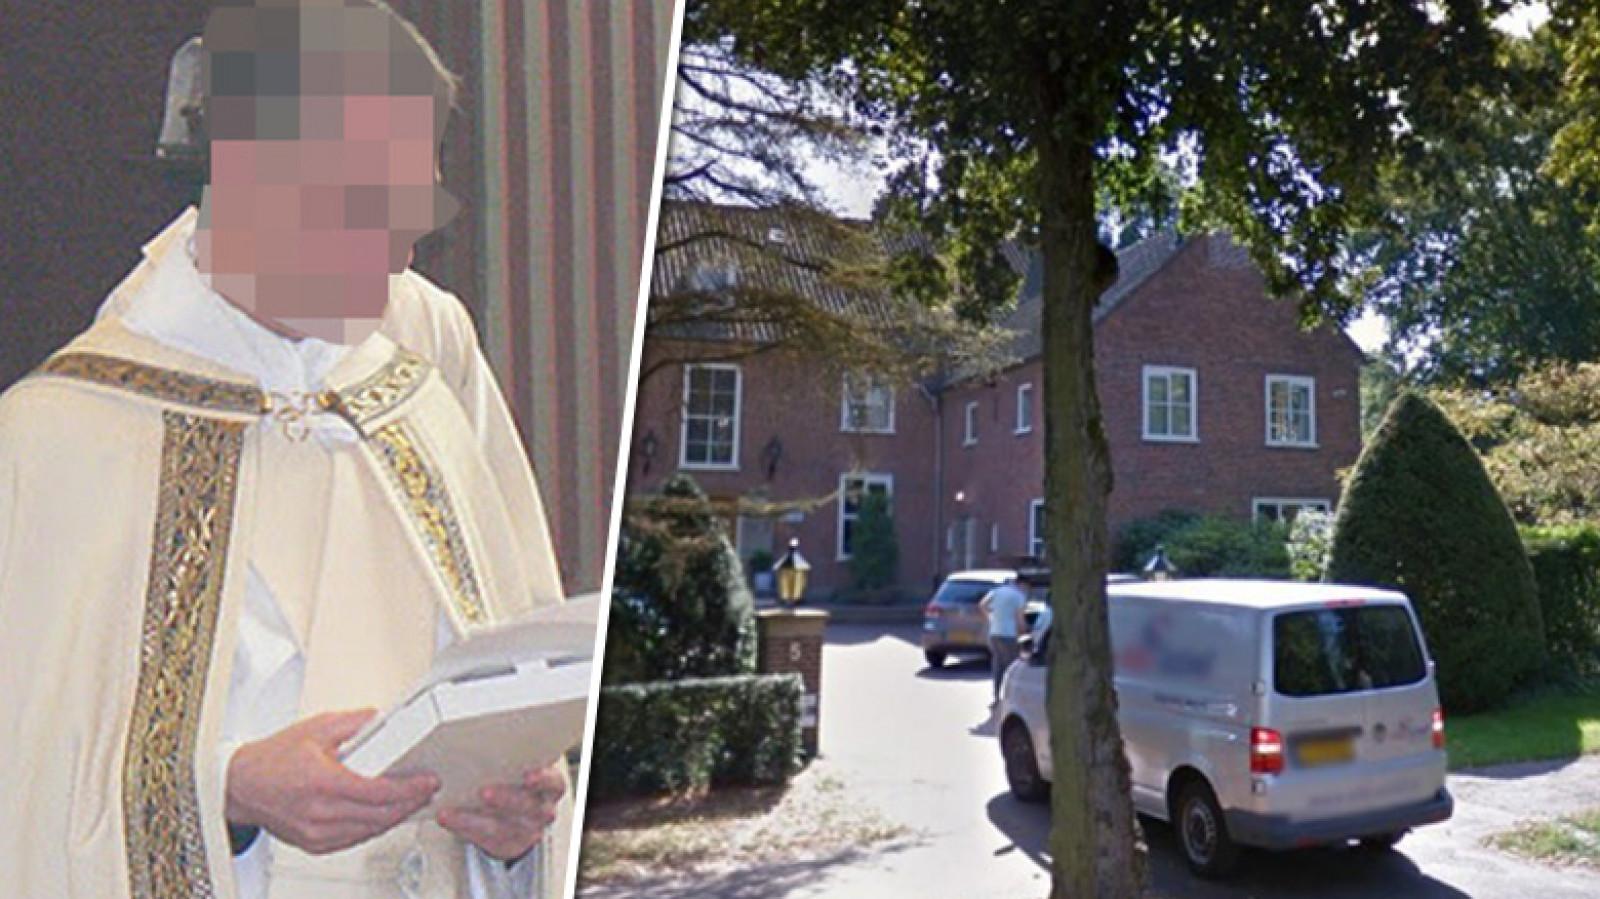 Oud Katholieke Kerk Nederland / Google Streetview